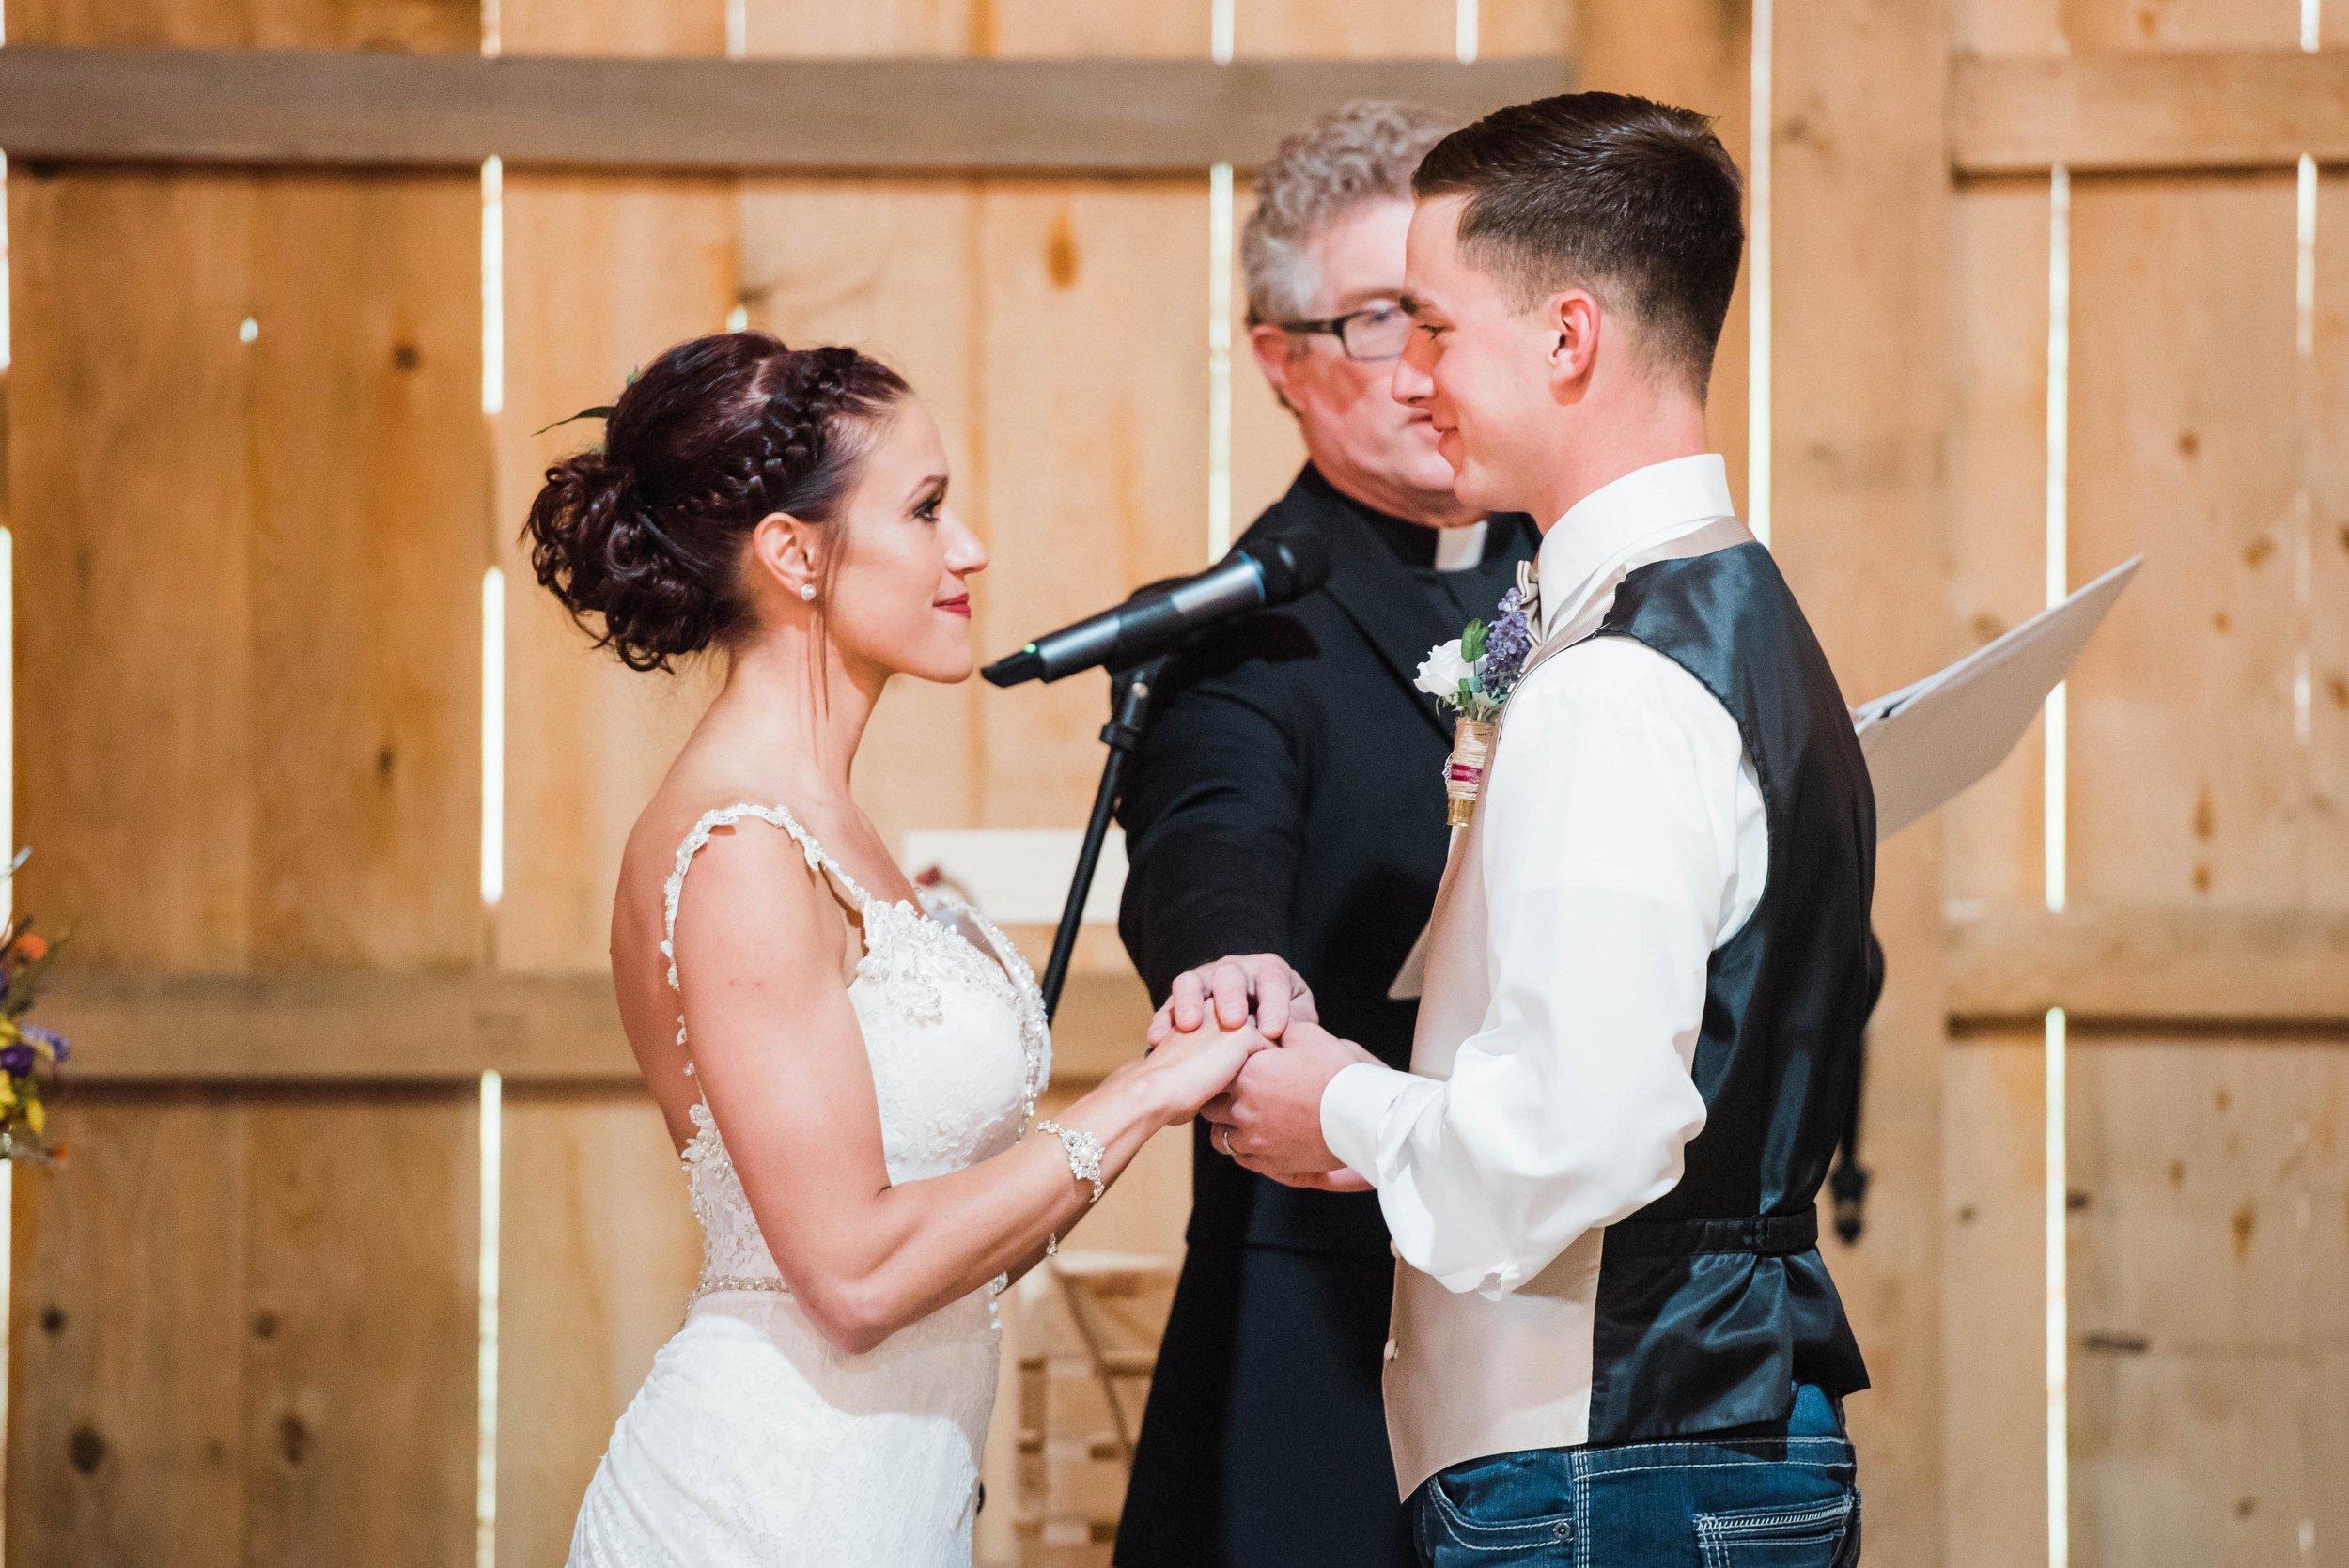 whisper hollow homestead wedding barn wedding pittsburgh photographer